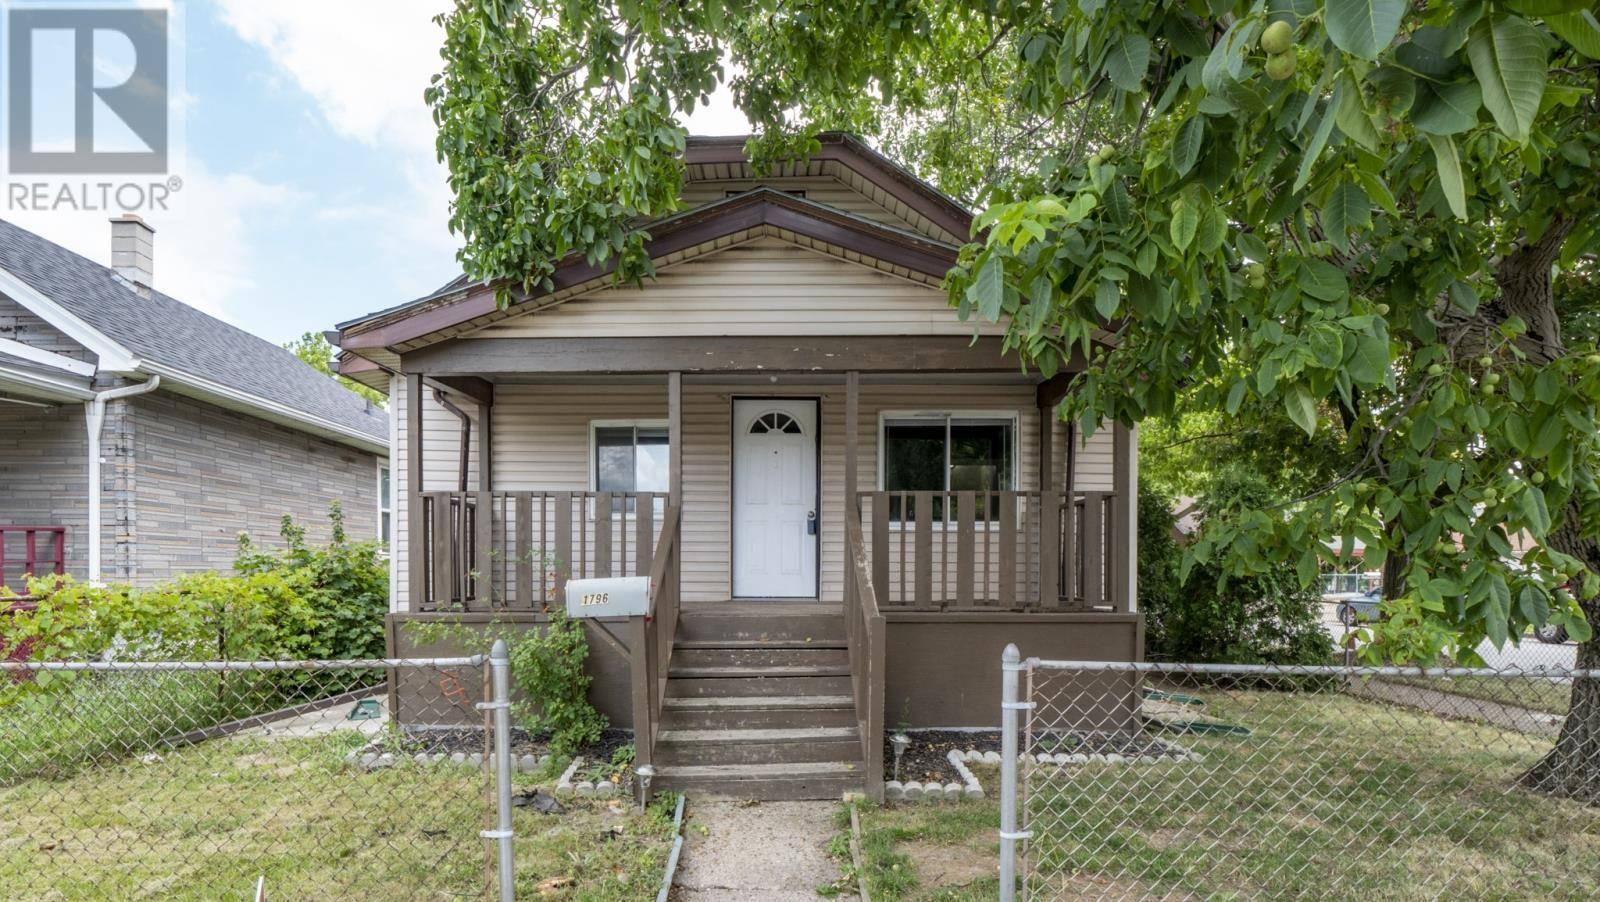 House for sale at 1796 Drouillard  Windsor Ontario - MLS: 19025544